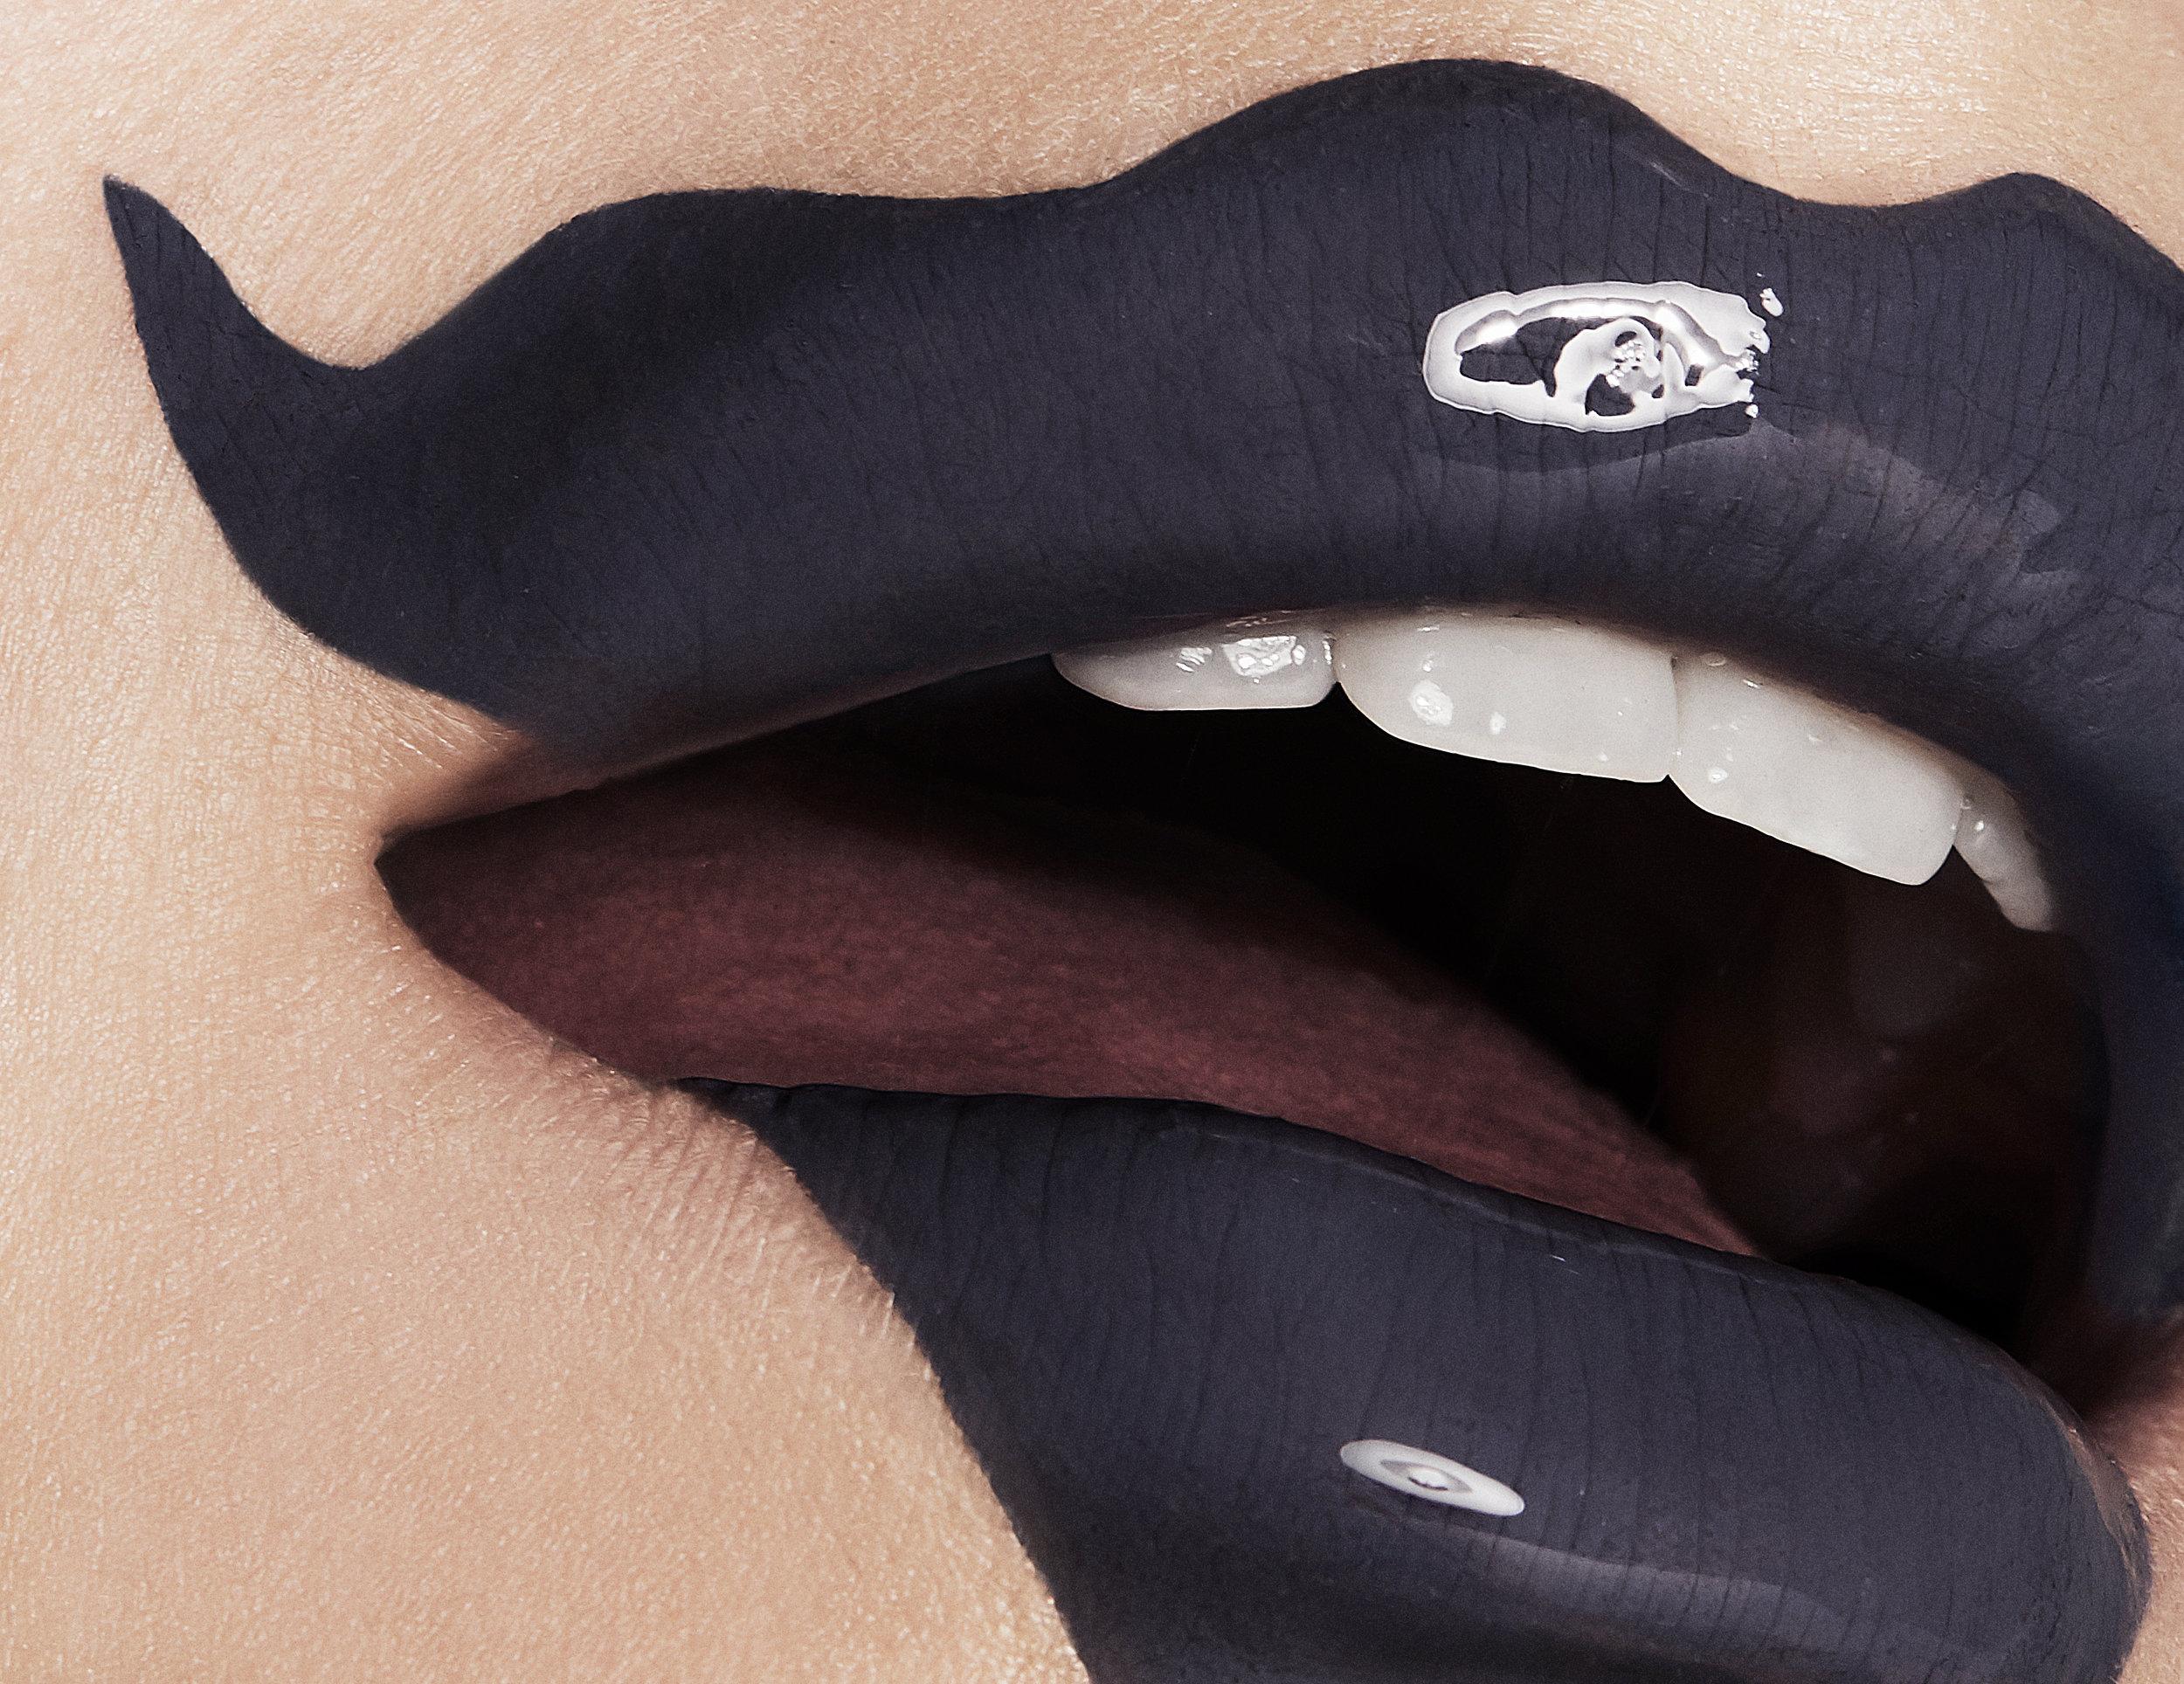 Overdrawn_Lips_03_105.jpg